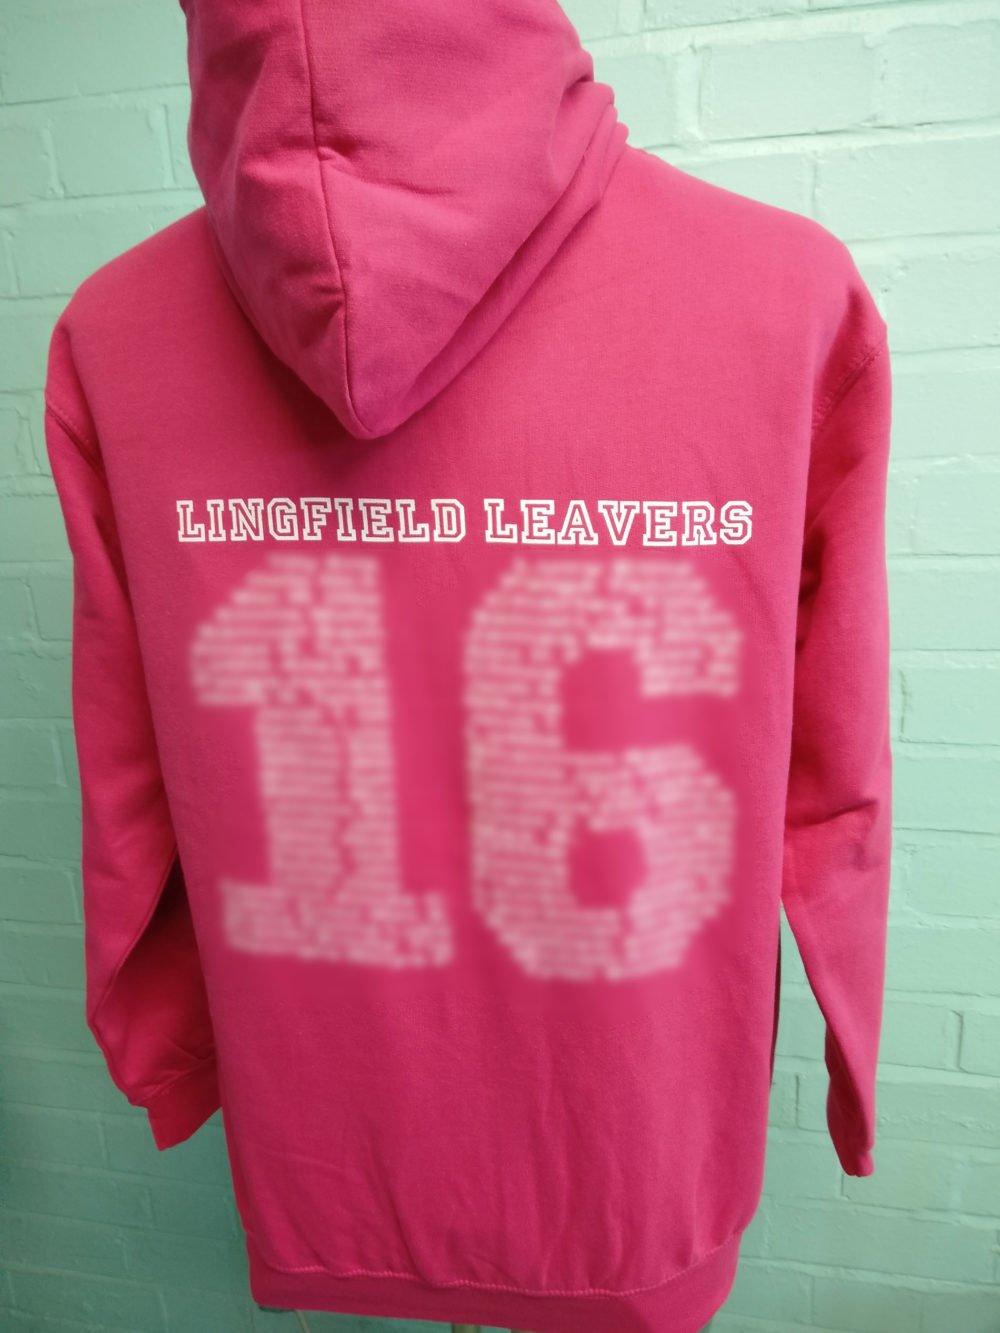 Lingfield Leavers 2016 Zippy Hoodies